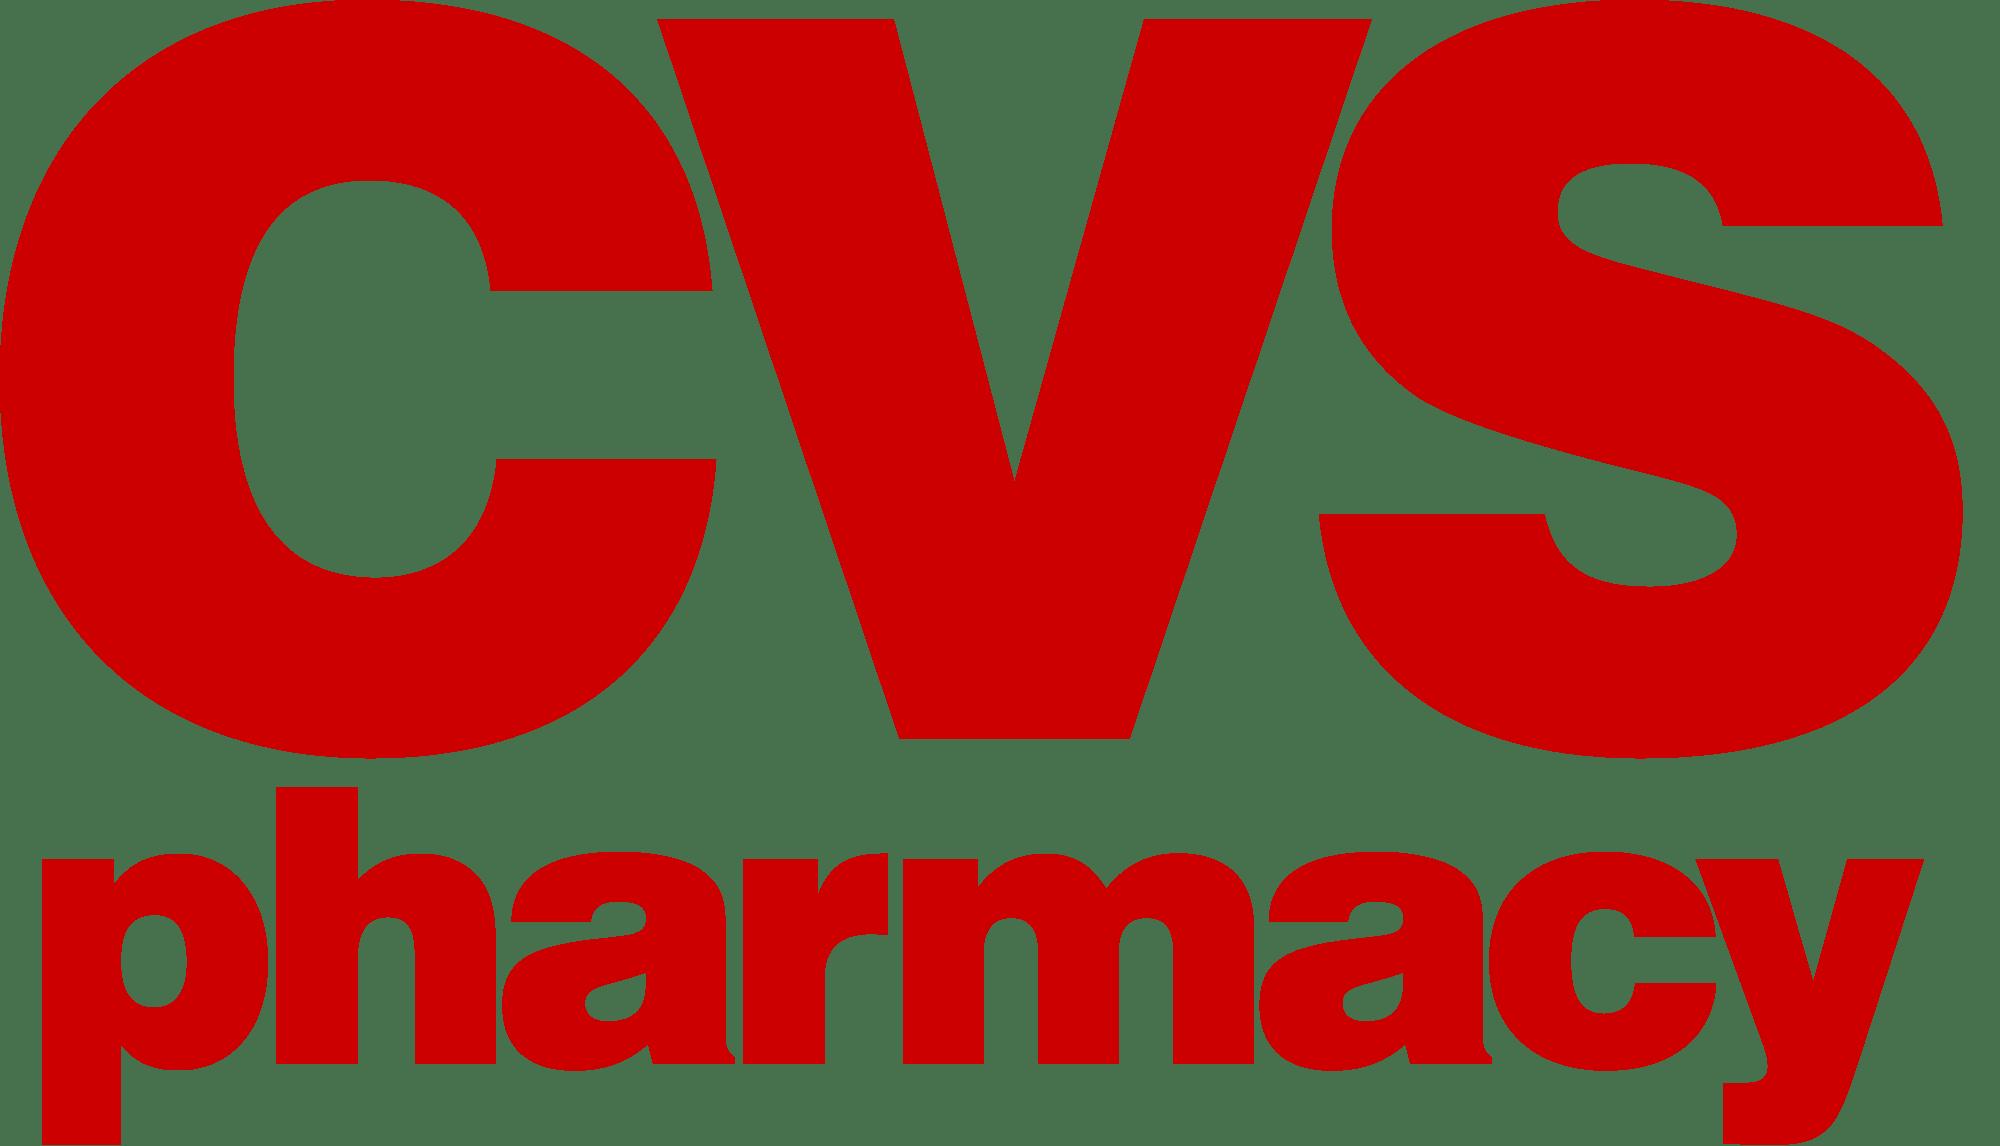 CVS Deal汇总 (10/30/16-11/05/16)